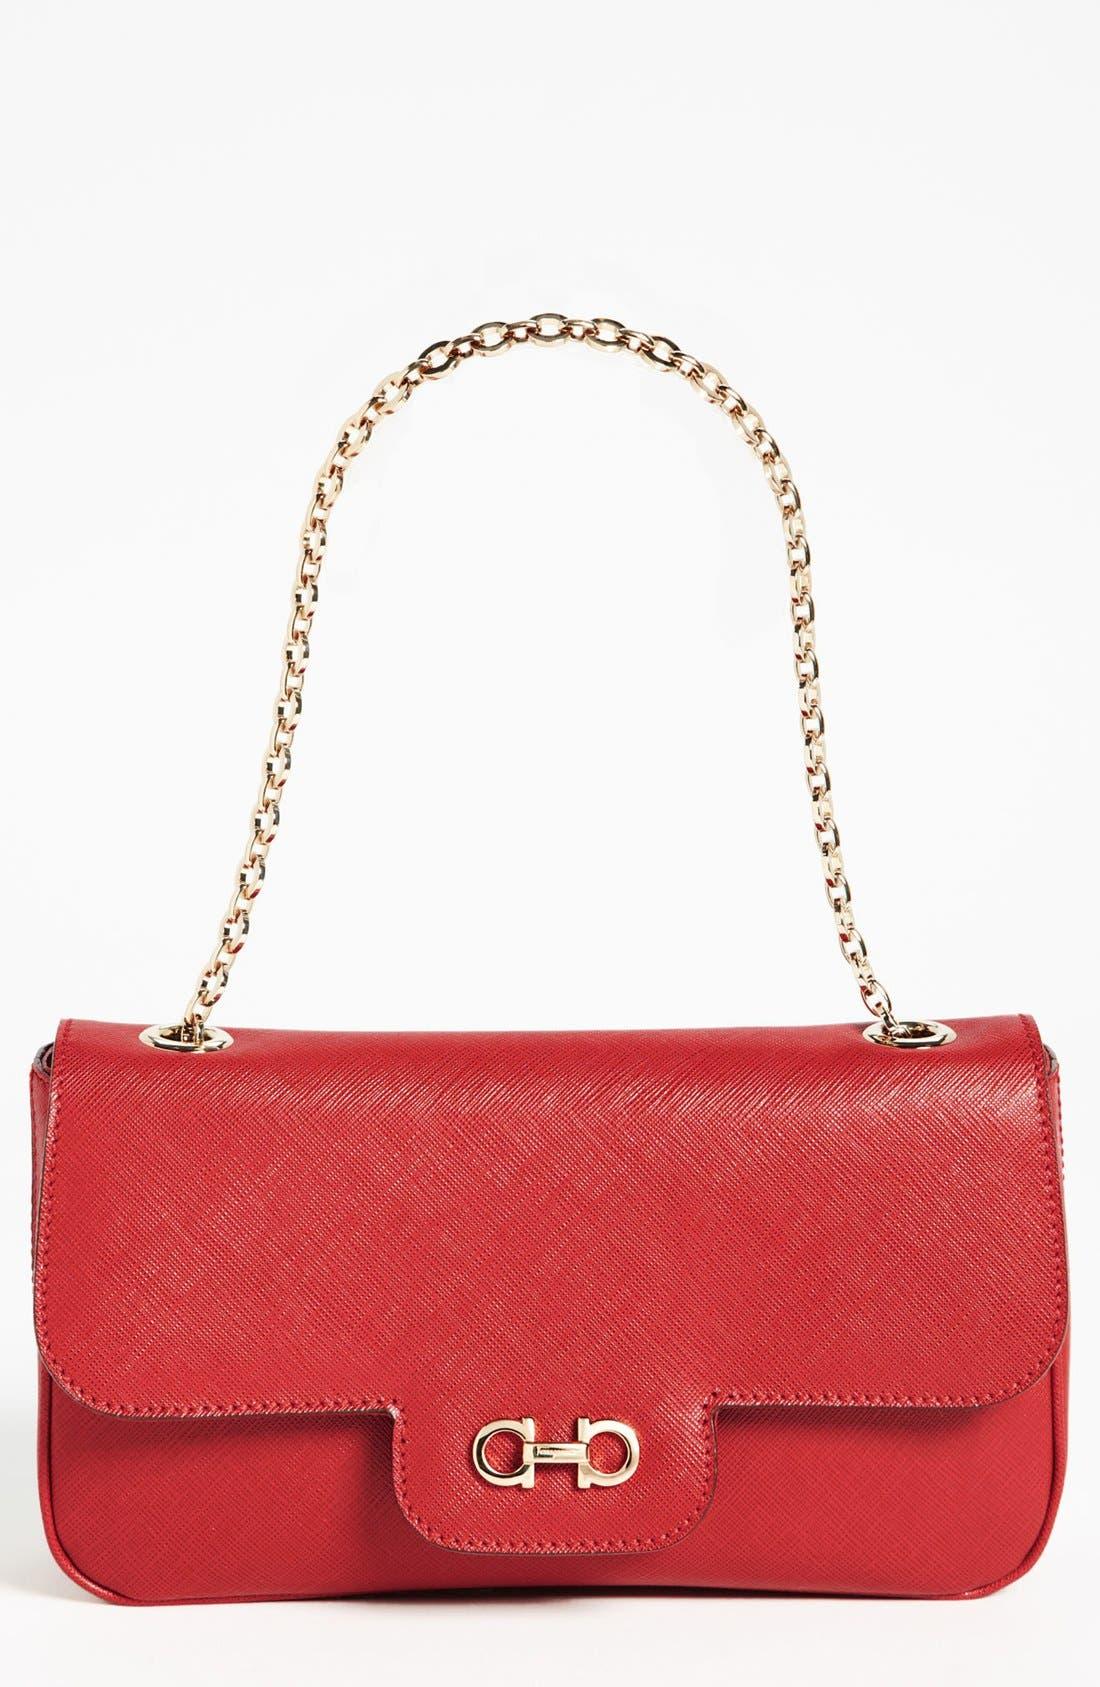 Main Image - Salvatore Ferragamo 'Luciana' Leather Shoulder Bag